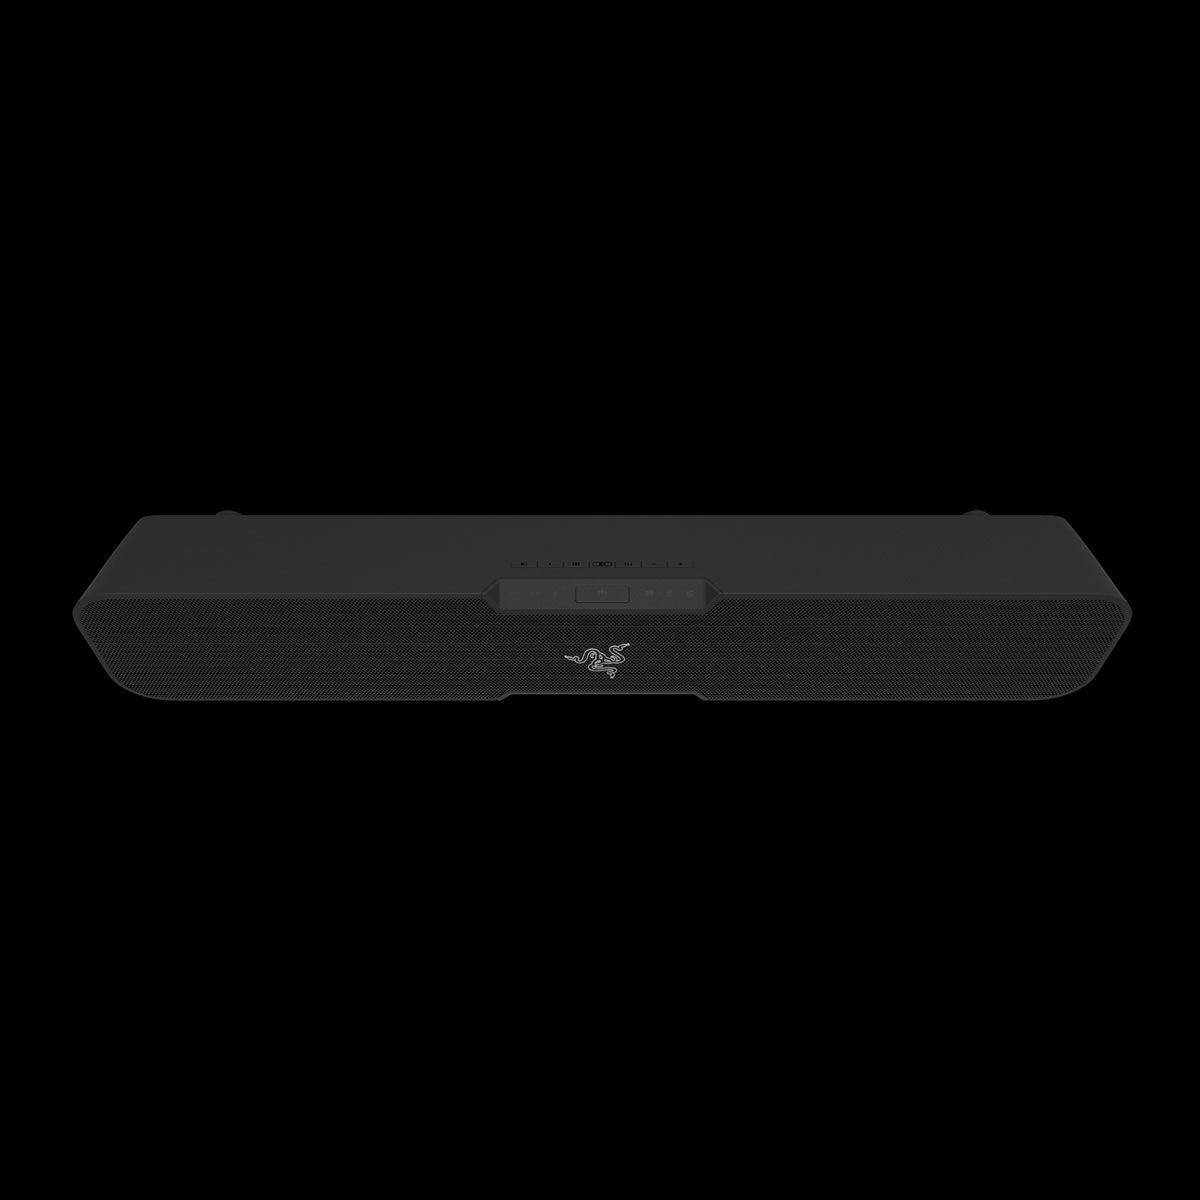 Razer Leviathan 51 Bluetooth Soundbar Rz05 01260100 R3g1 Hd Wireless Speaker